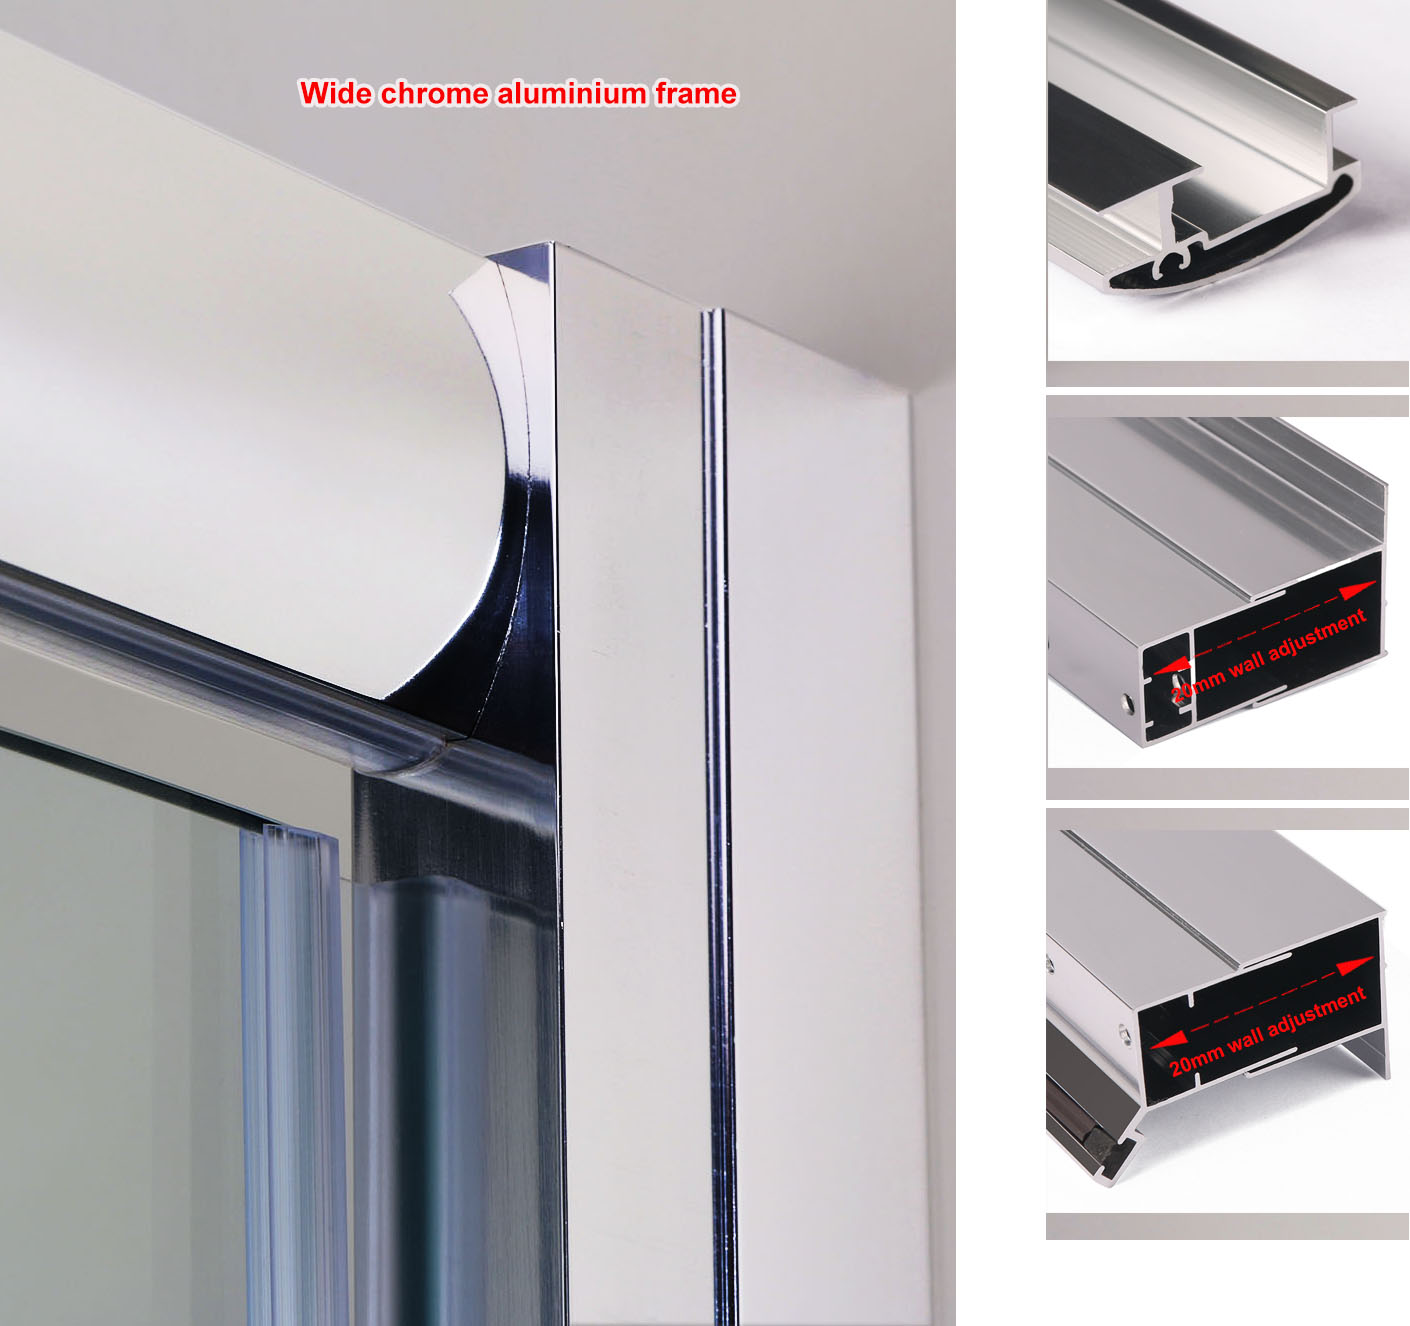 Details About Walk In Bifold Pivot Hinge Sliding Shower Enclosures Glass Door Screen Cubicles